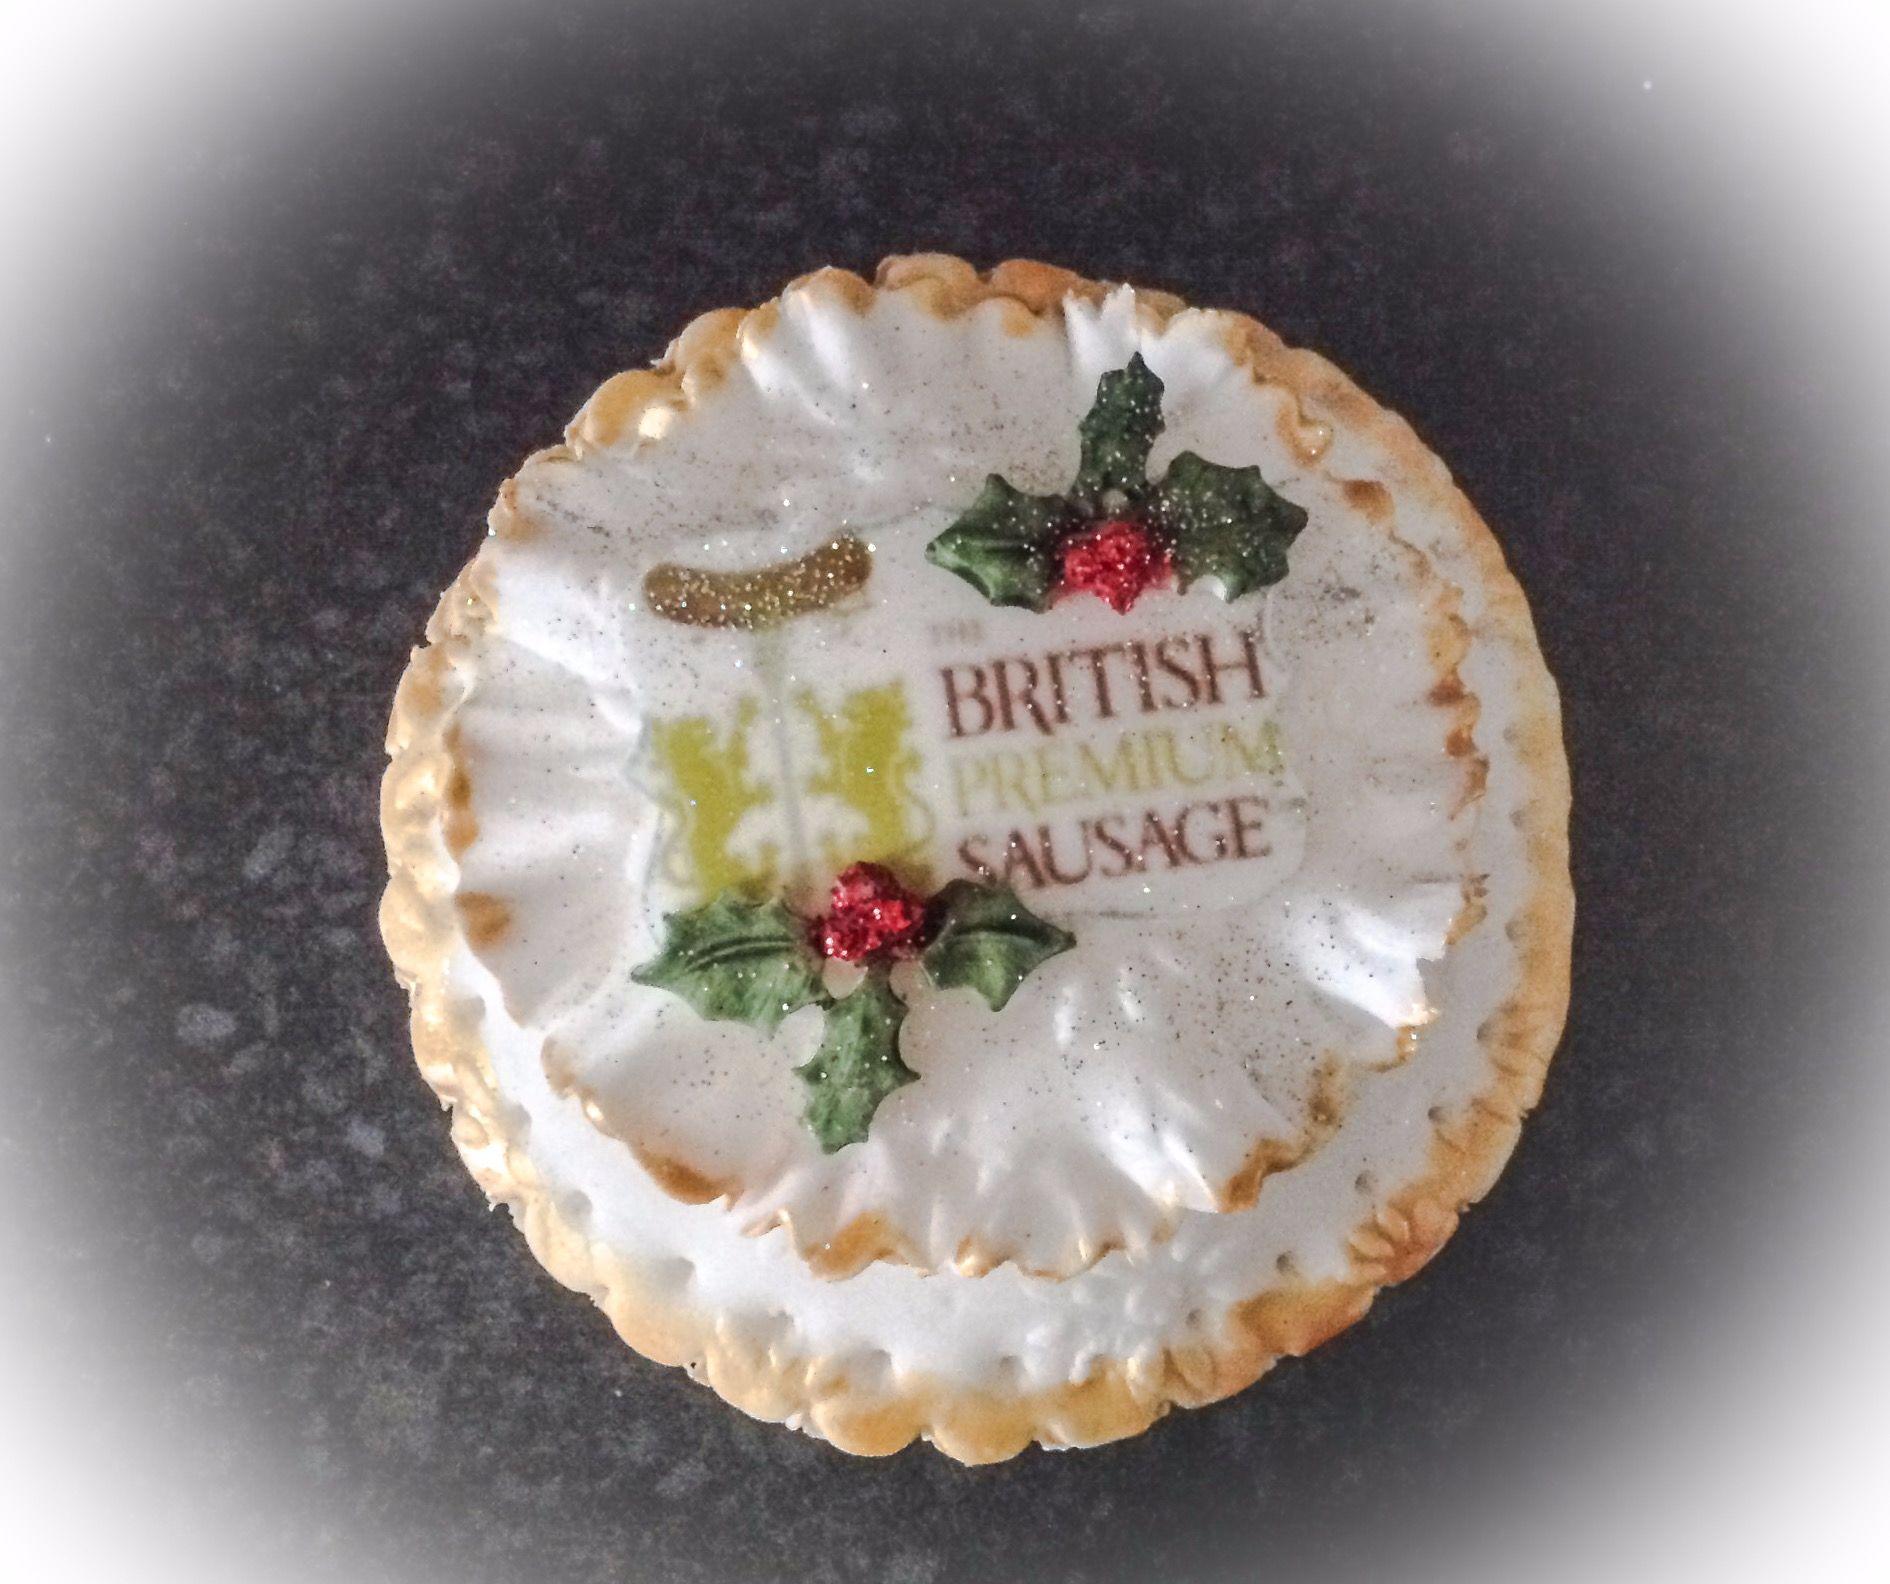 british premium sausage cupcake